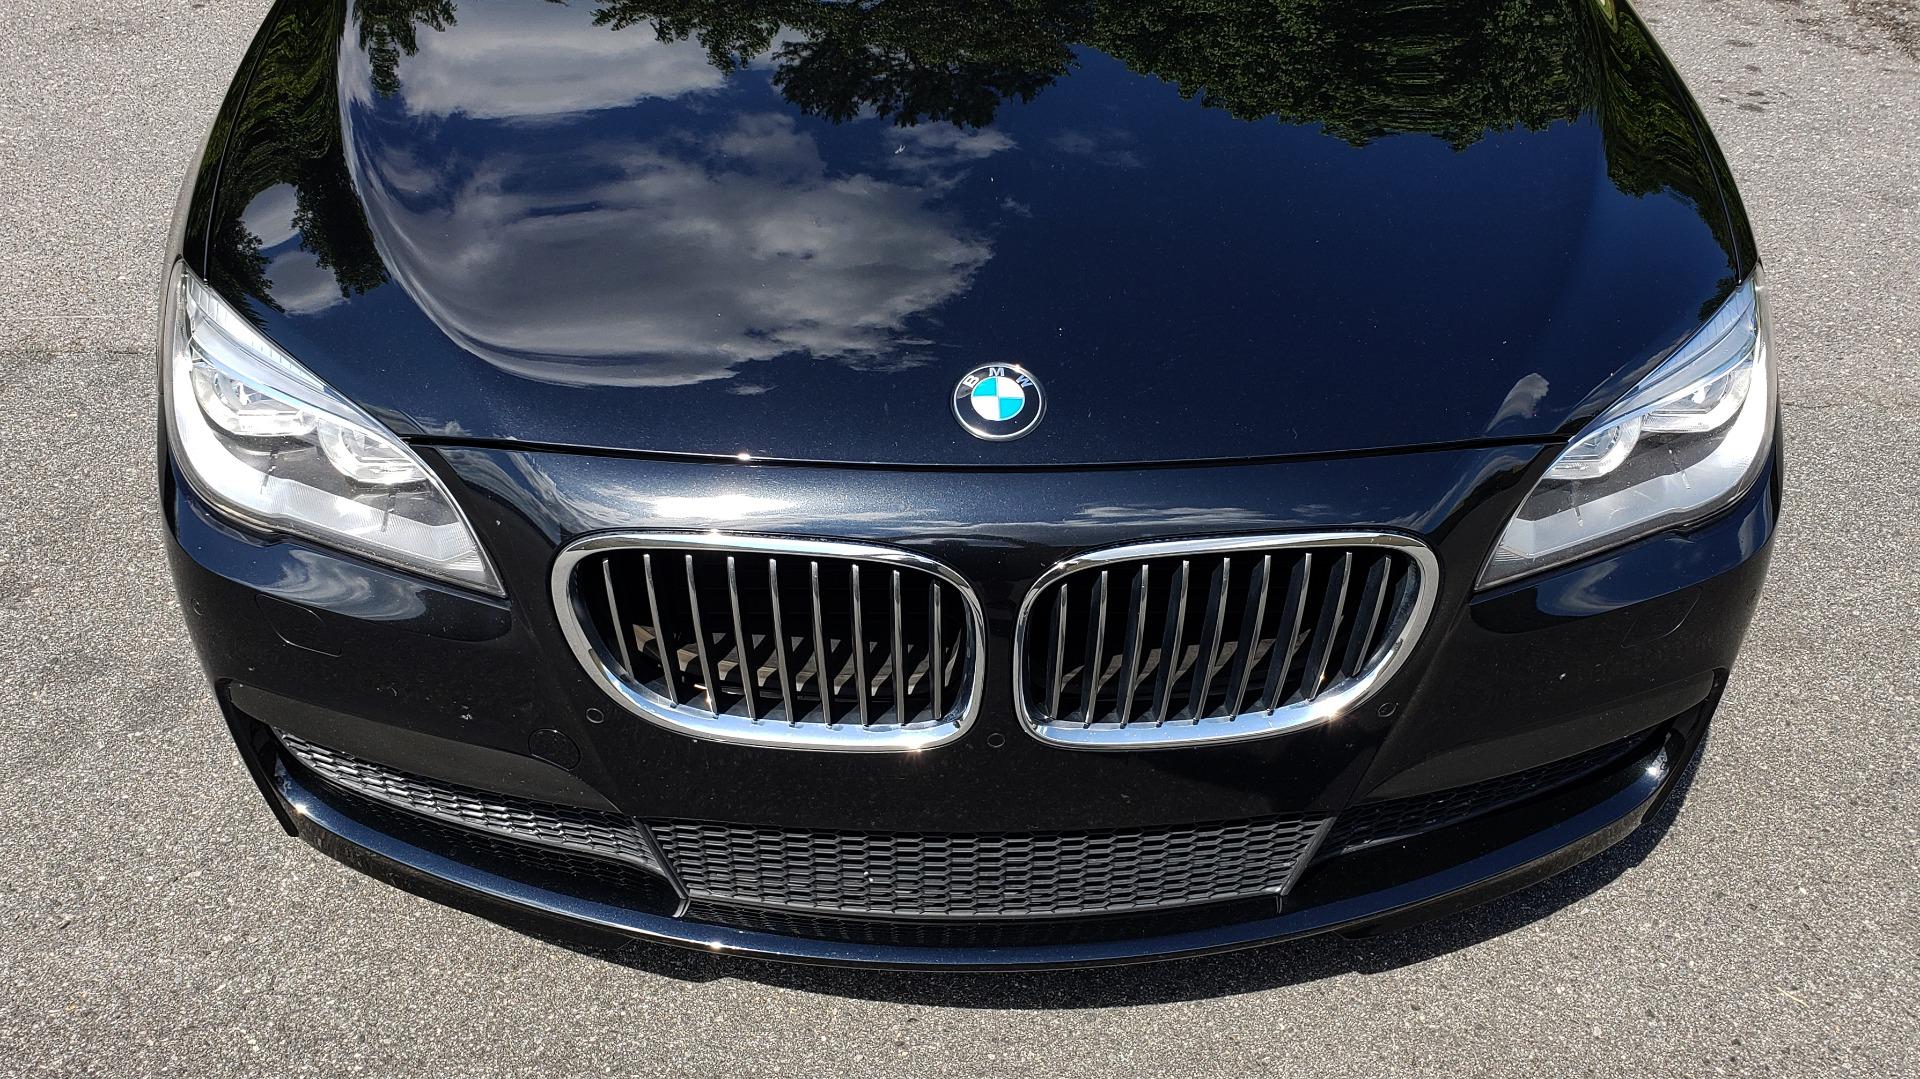 Used 2014 BMW 7 SERIES 750LI M-SPORT / EXEC PKG / DRVR ASST / LIGHTING / NAV / SUNROOF for sale Sold at Formula Imports in Charlotte NC 28227 20